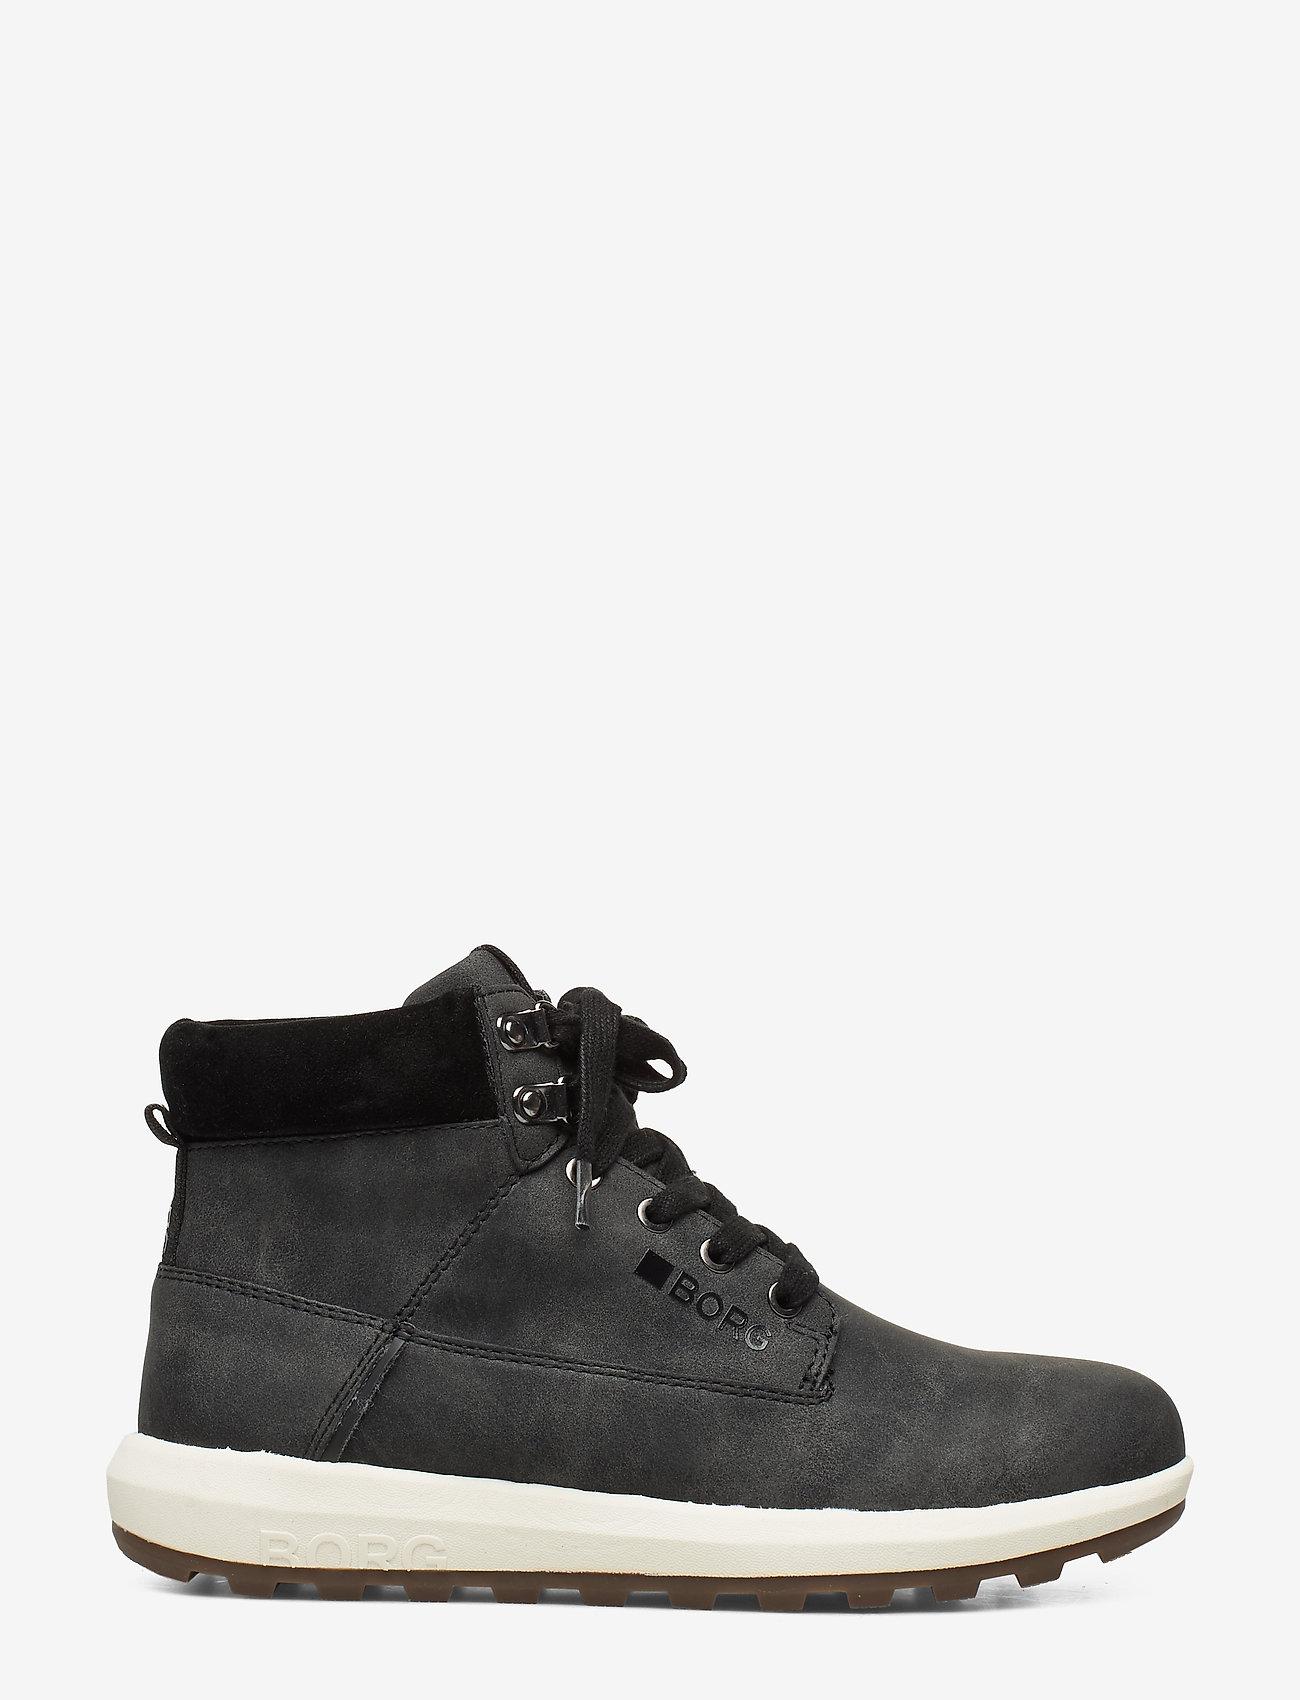 Björn Borg - R800 Hgh Fur W - high top sneakers - black - 1